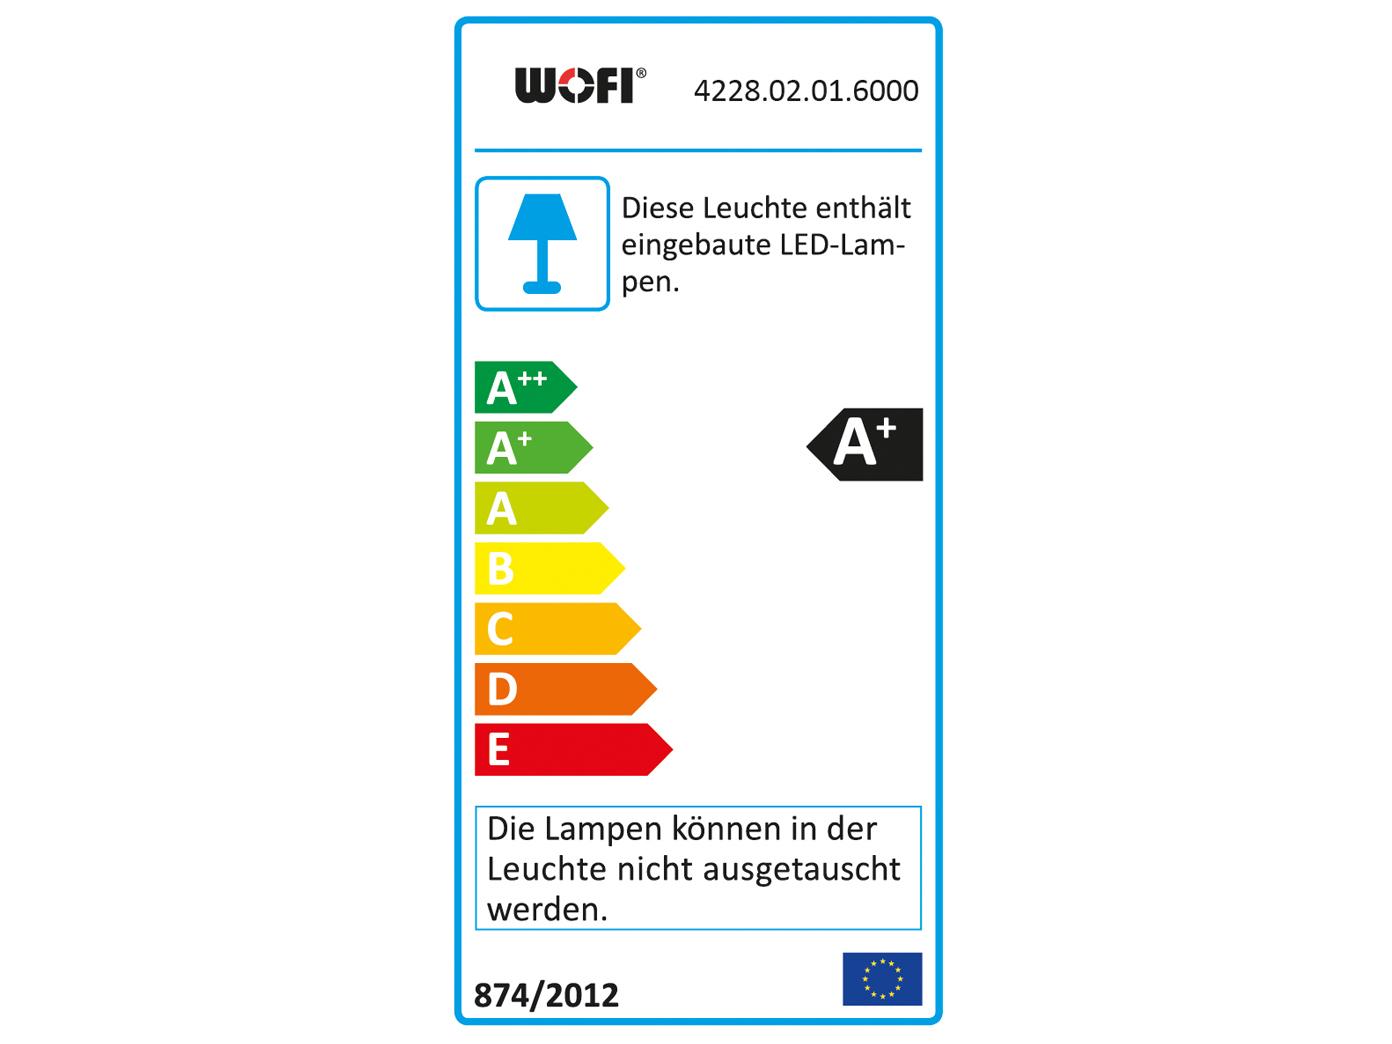 LED Wandlampe Wandstrahler Wandleuchte Lampe Spot Wofi 4228.02.01.6000